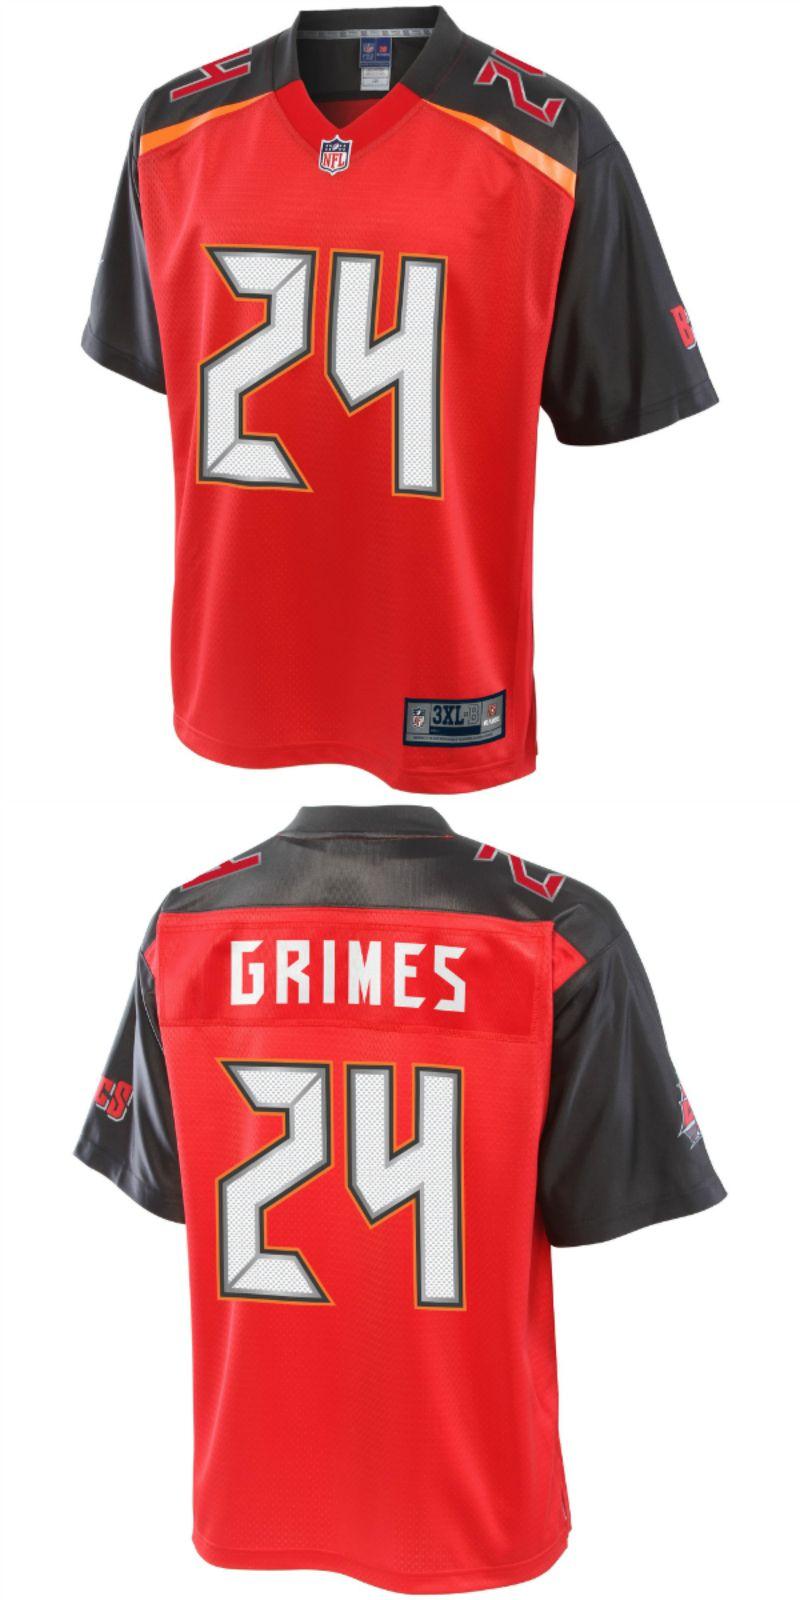 buy popular d4c16 850f0 UP TO 70% OFF. Brent Grimes Tampa Bay Buccaneers NFL Pro ...